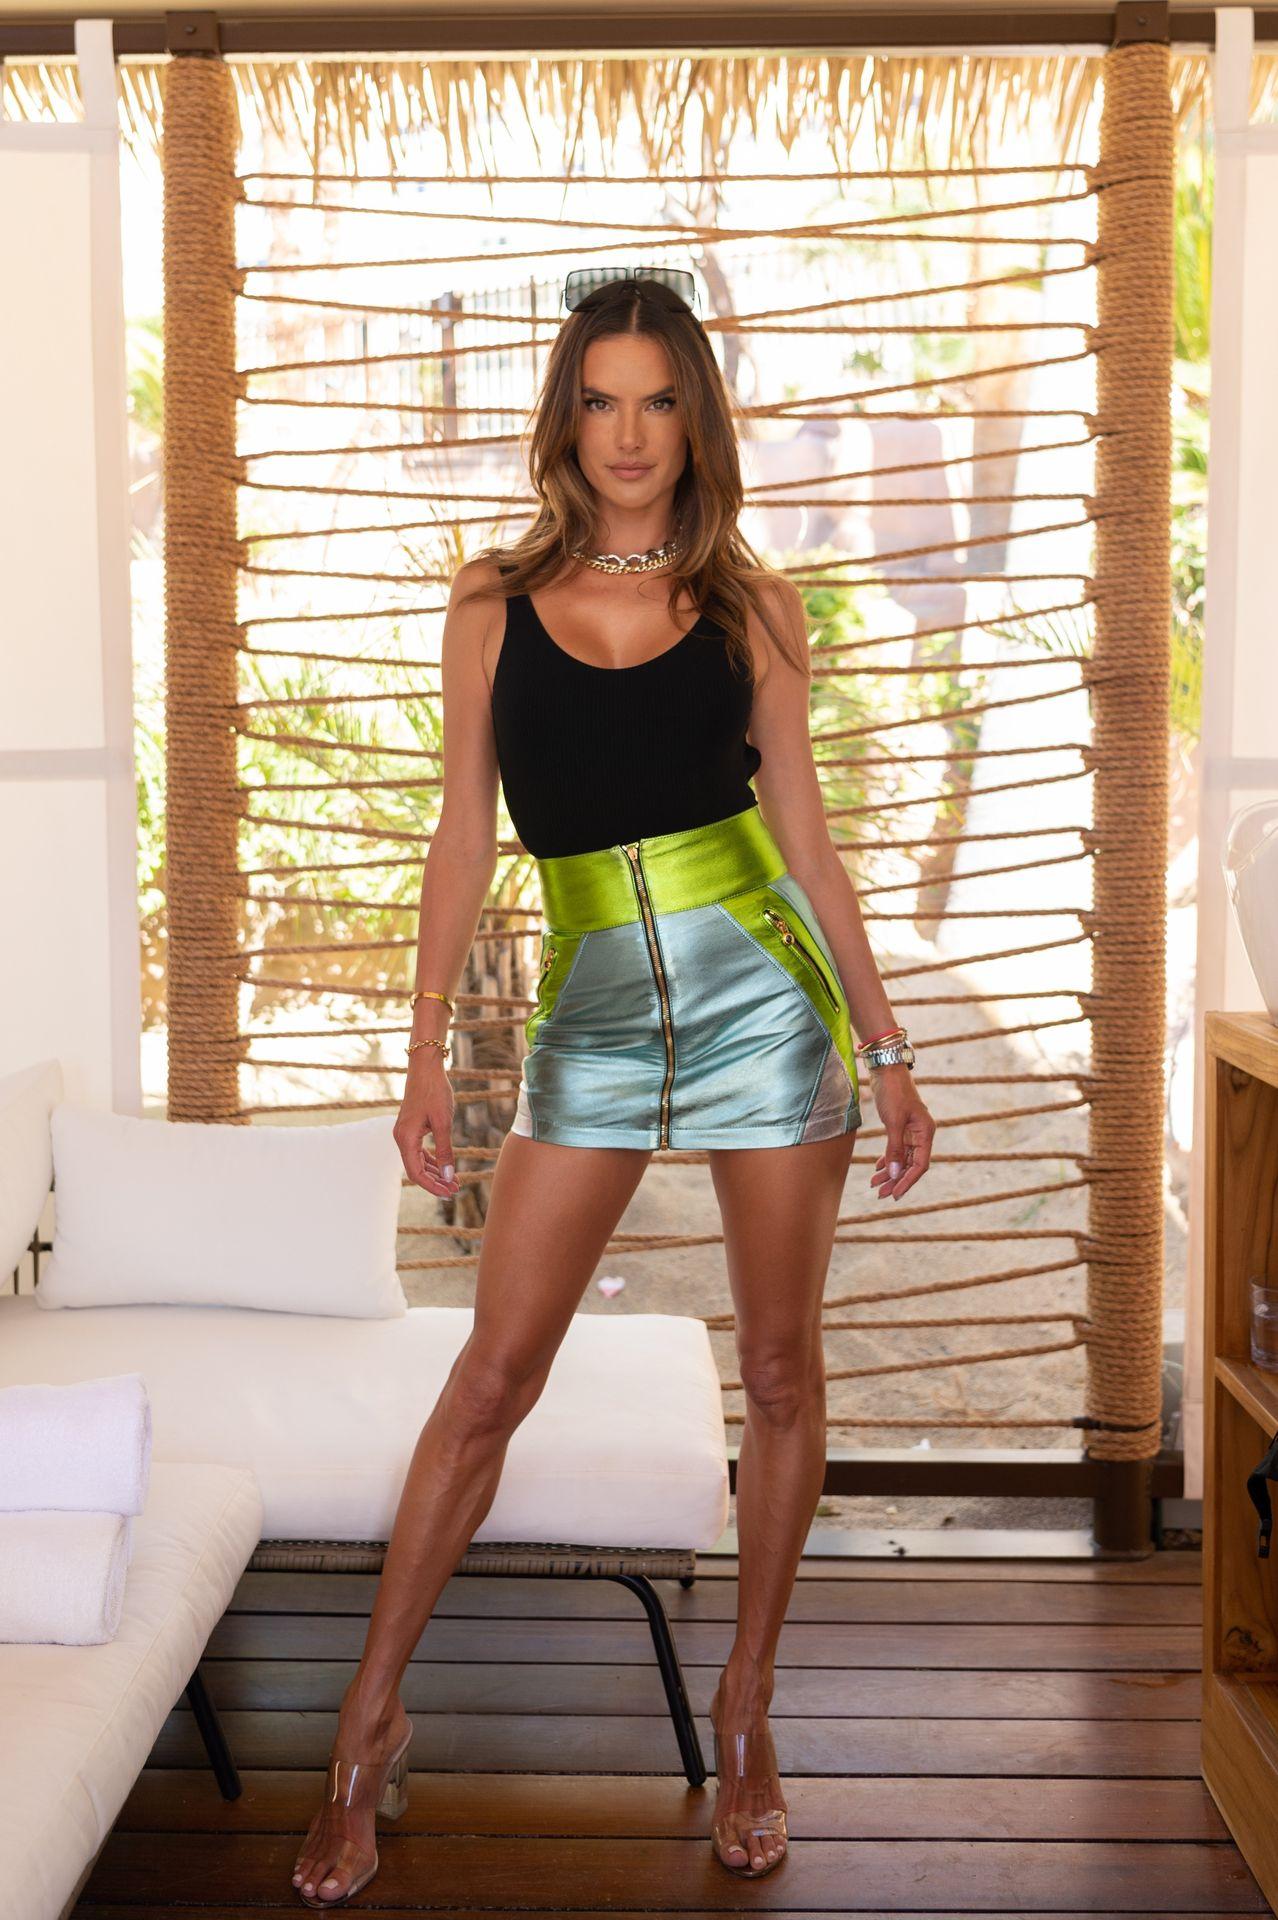 Alessandra-Ambrosio-Sexy-1-thefappeningblog.com_.jpg